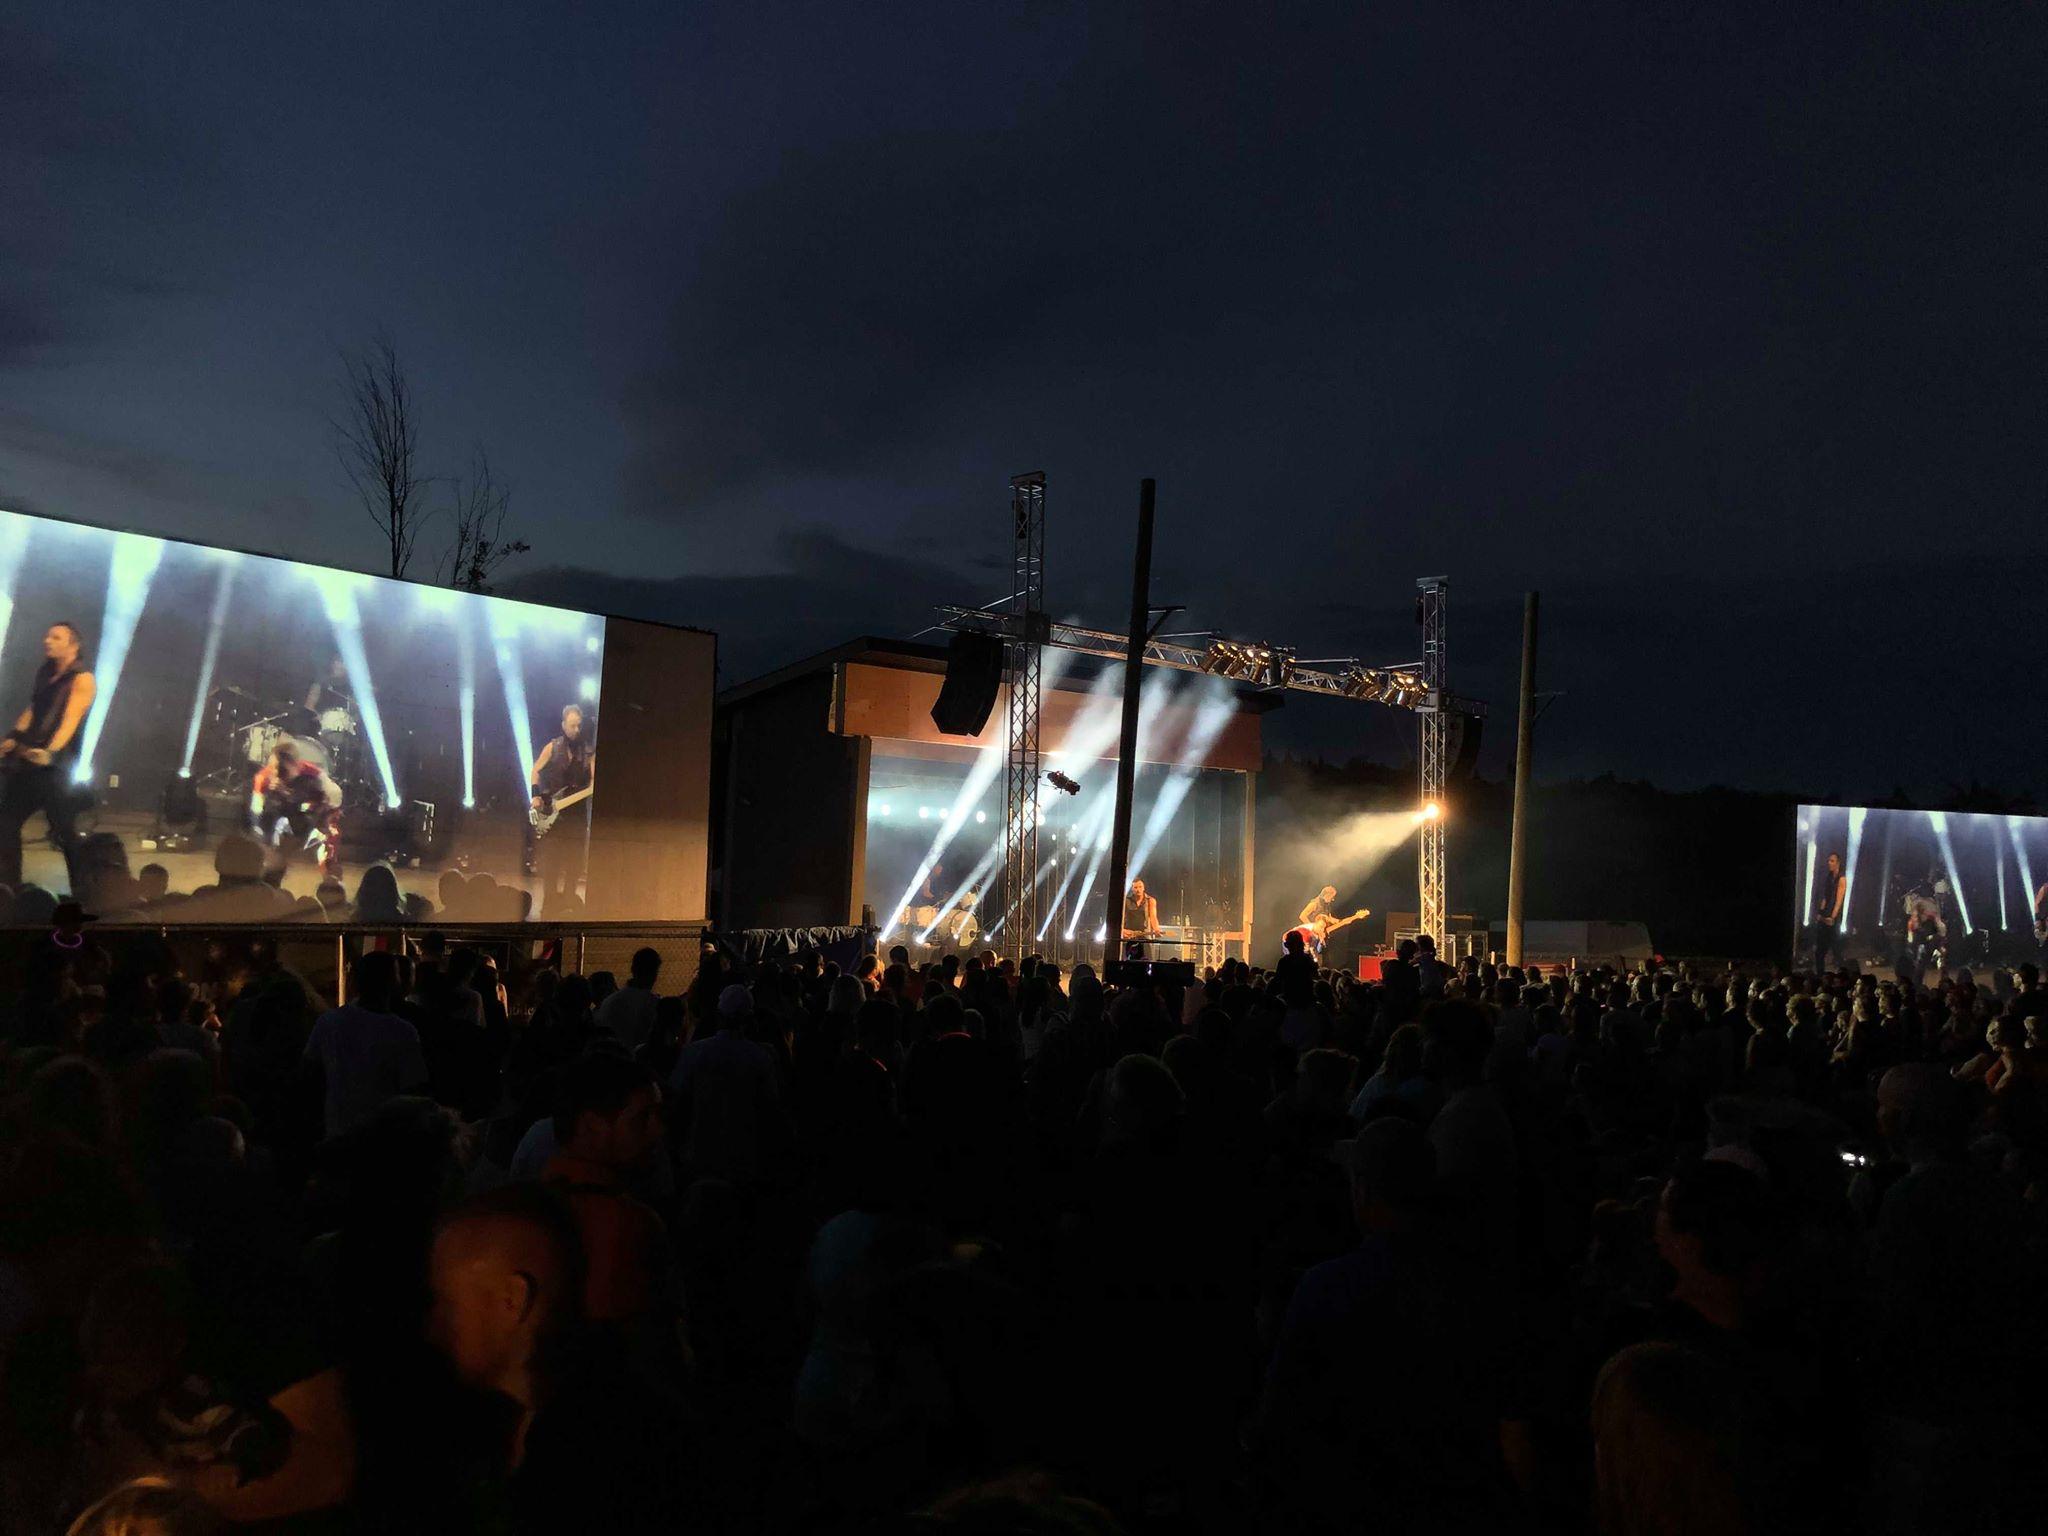 http://www.campingatlantide.com/wp-content/uploads/2019/07/alterego-showband-complexe-atlantide-2019-11.jpg